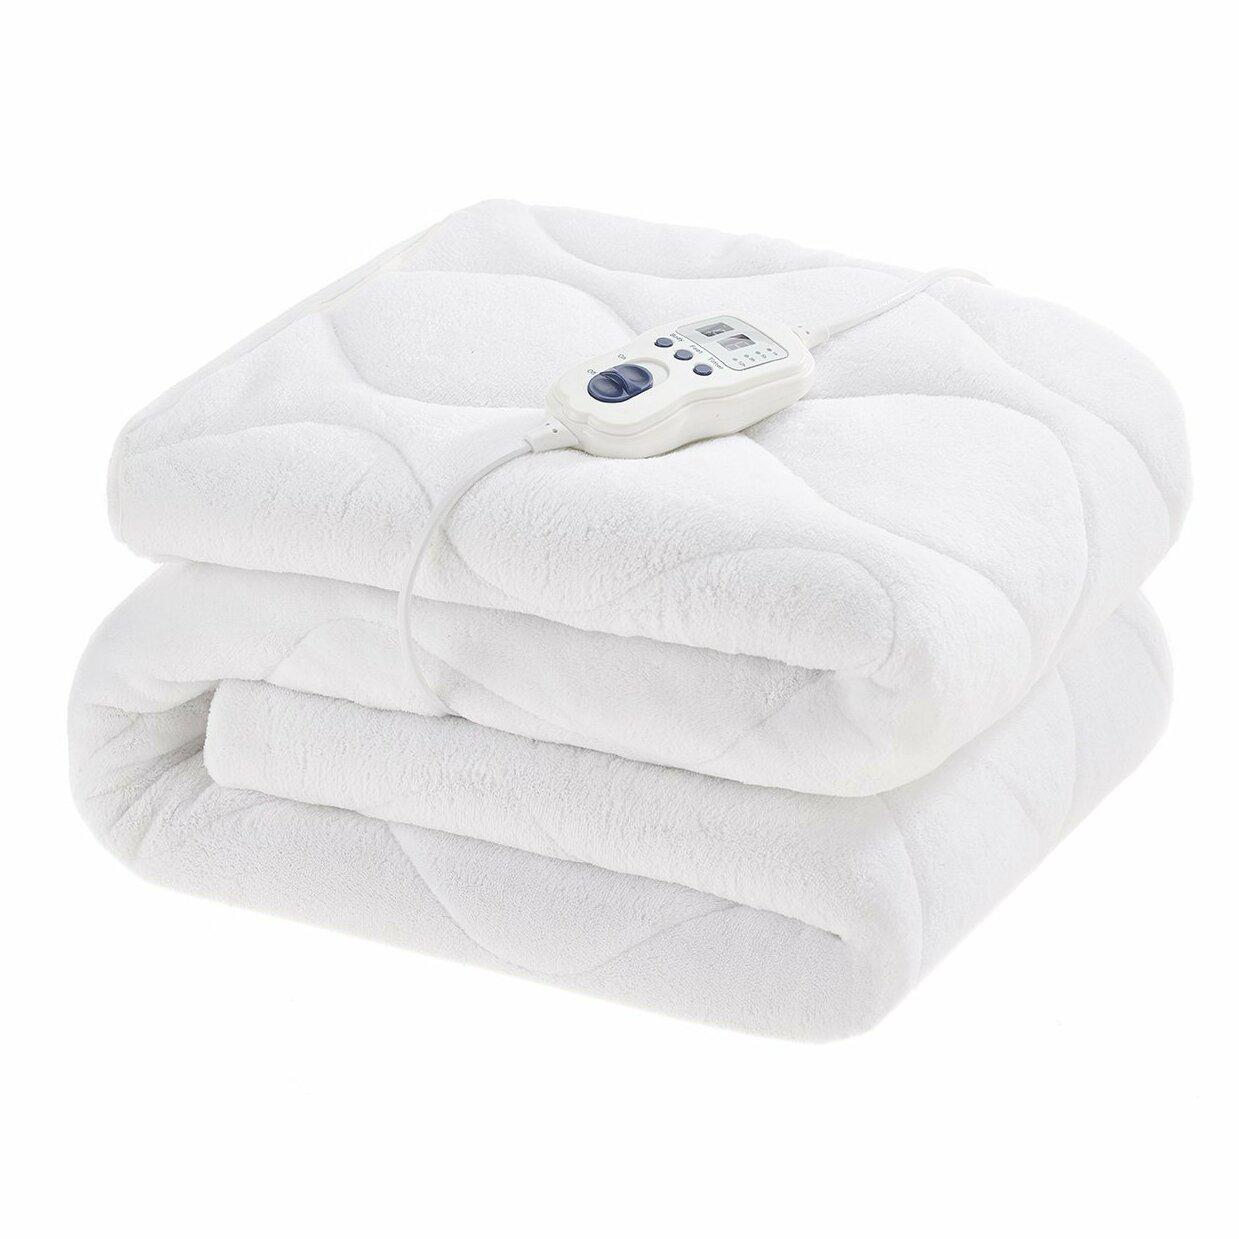 Slumberdown Wonderfully Warm Control Electric Blanket Reviews Wayfair Co Uk